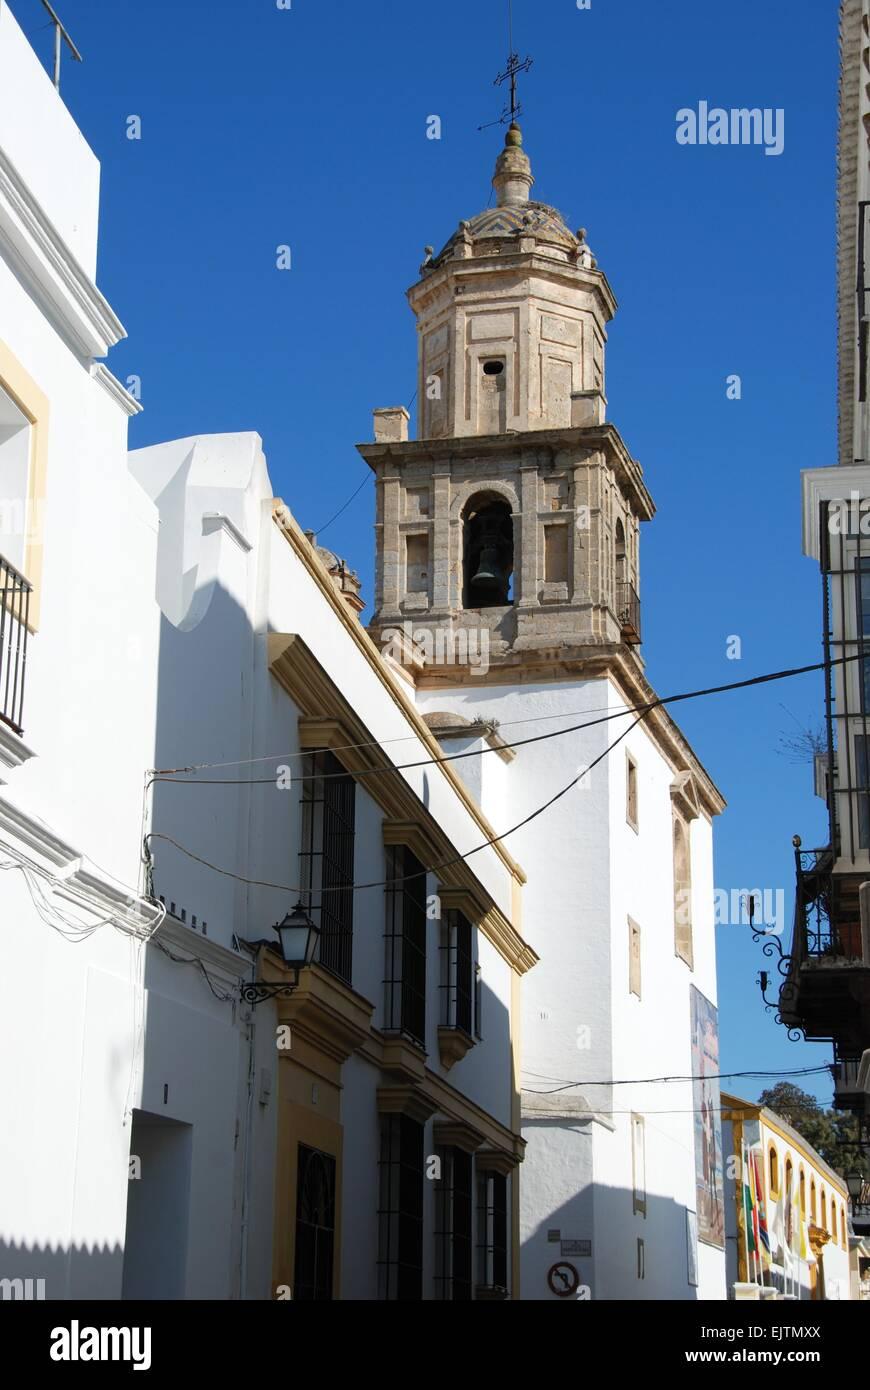 Church with bell tower (Neustra Senora de la Caridad), Sanlucar de Barrameda, Cadiz Province, Andalusia, Spain, - Stock Image